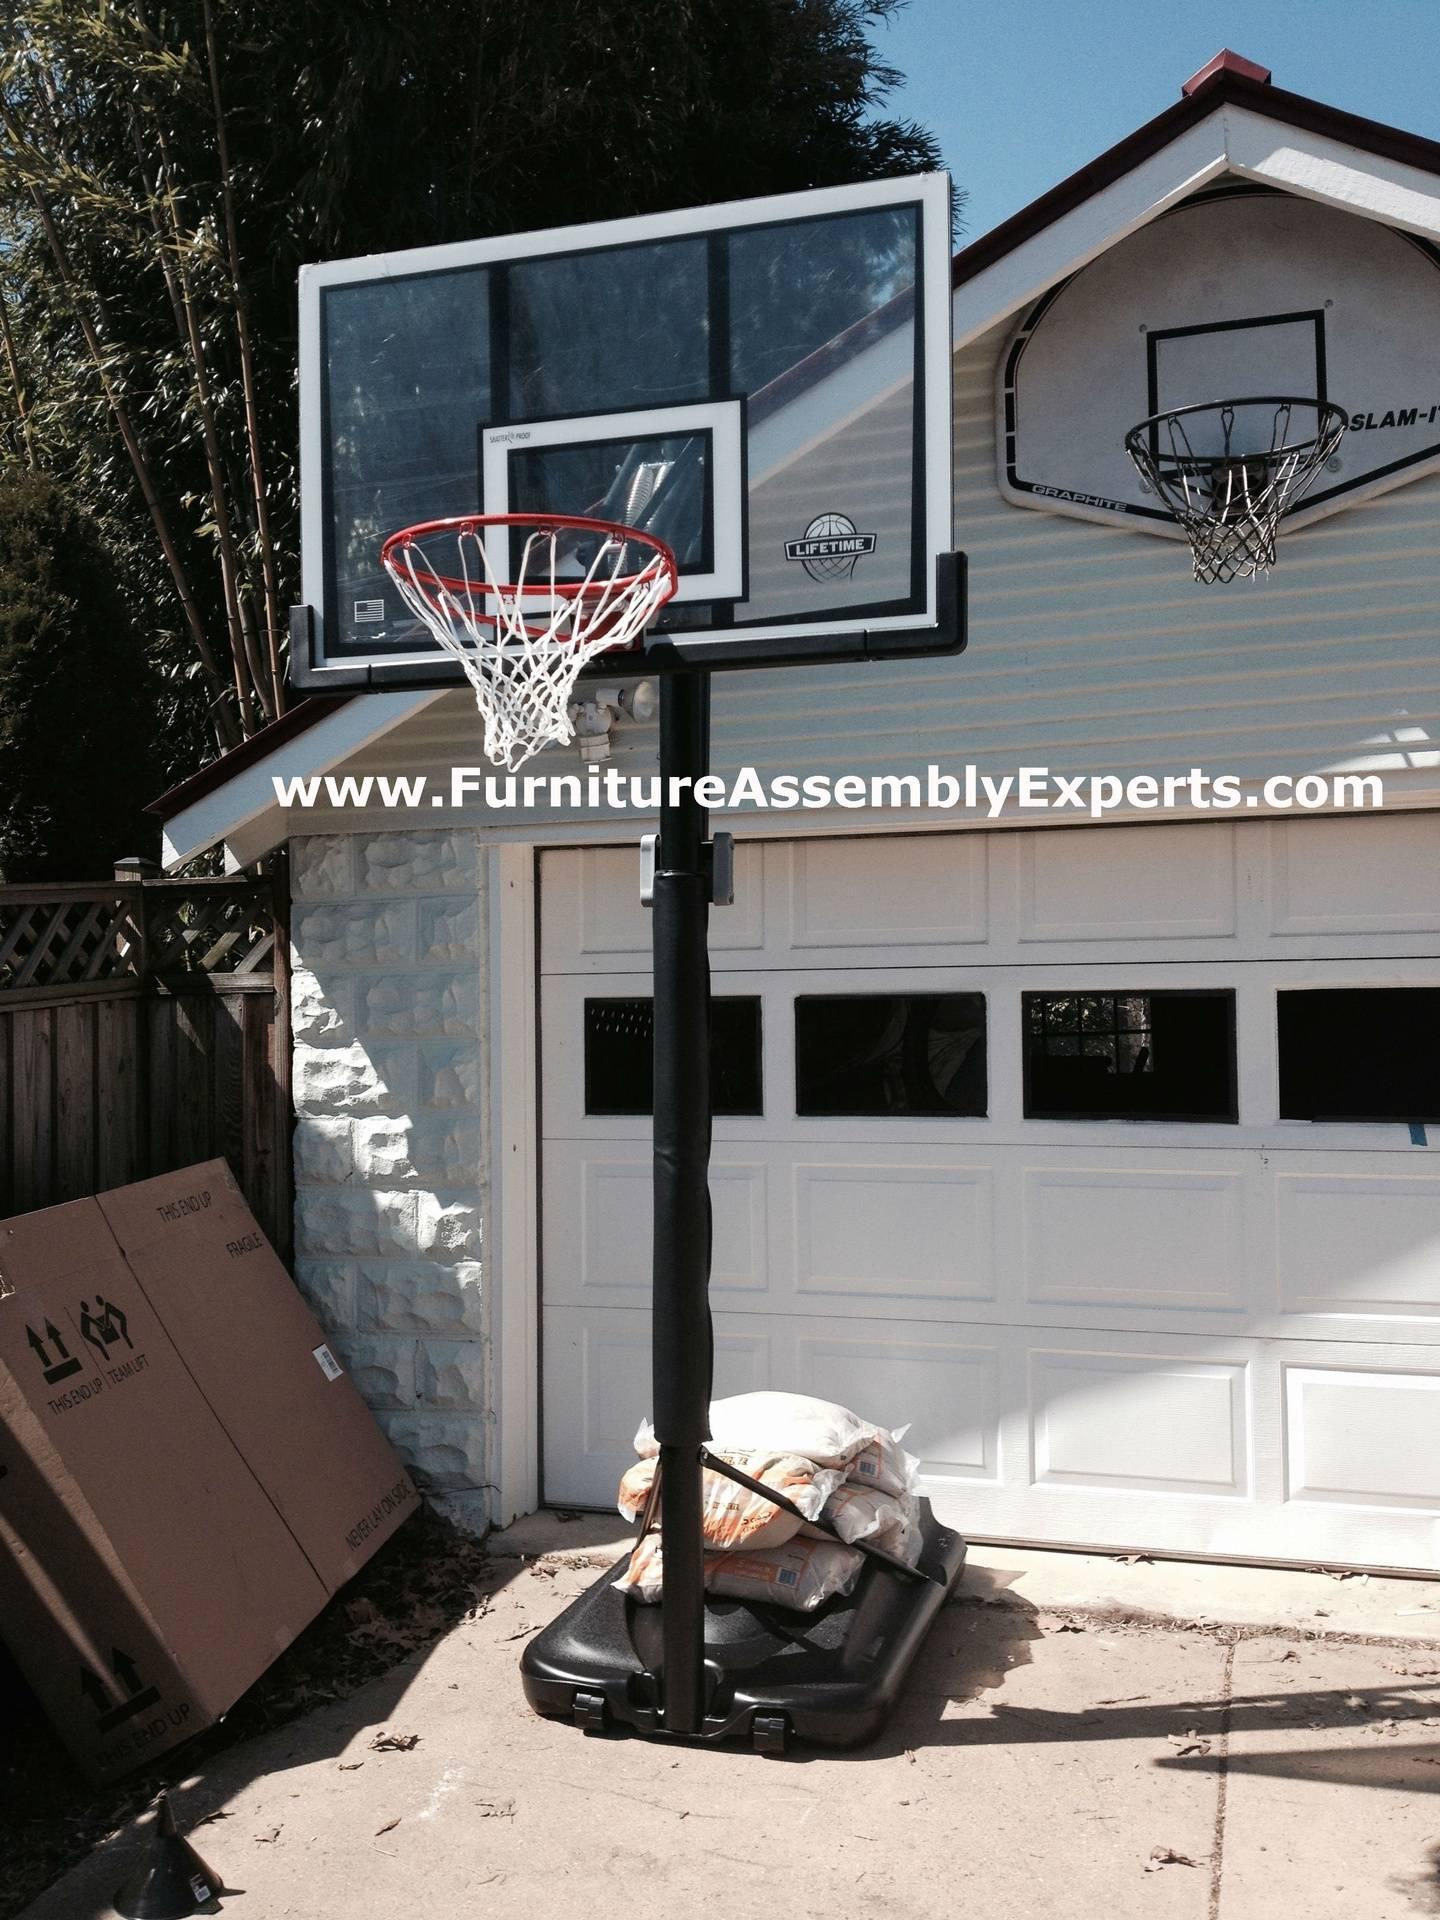 amazon portable basketball hoop assembly service in manassas va